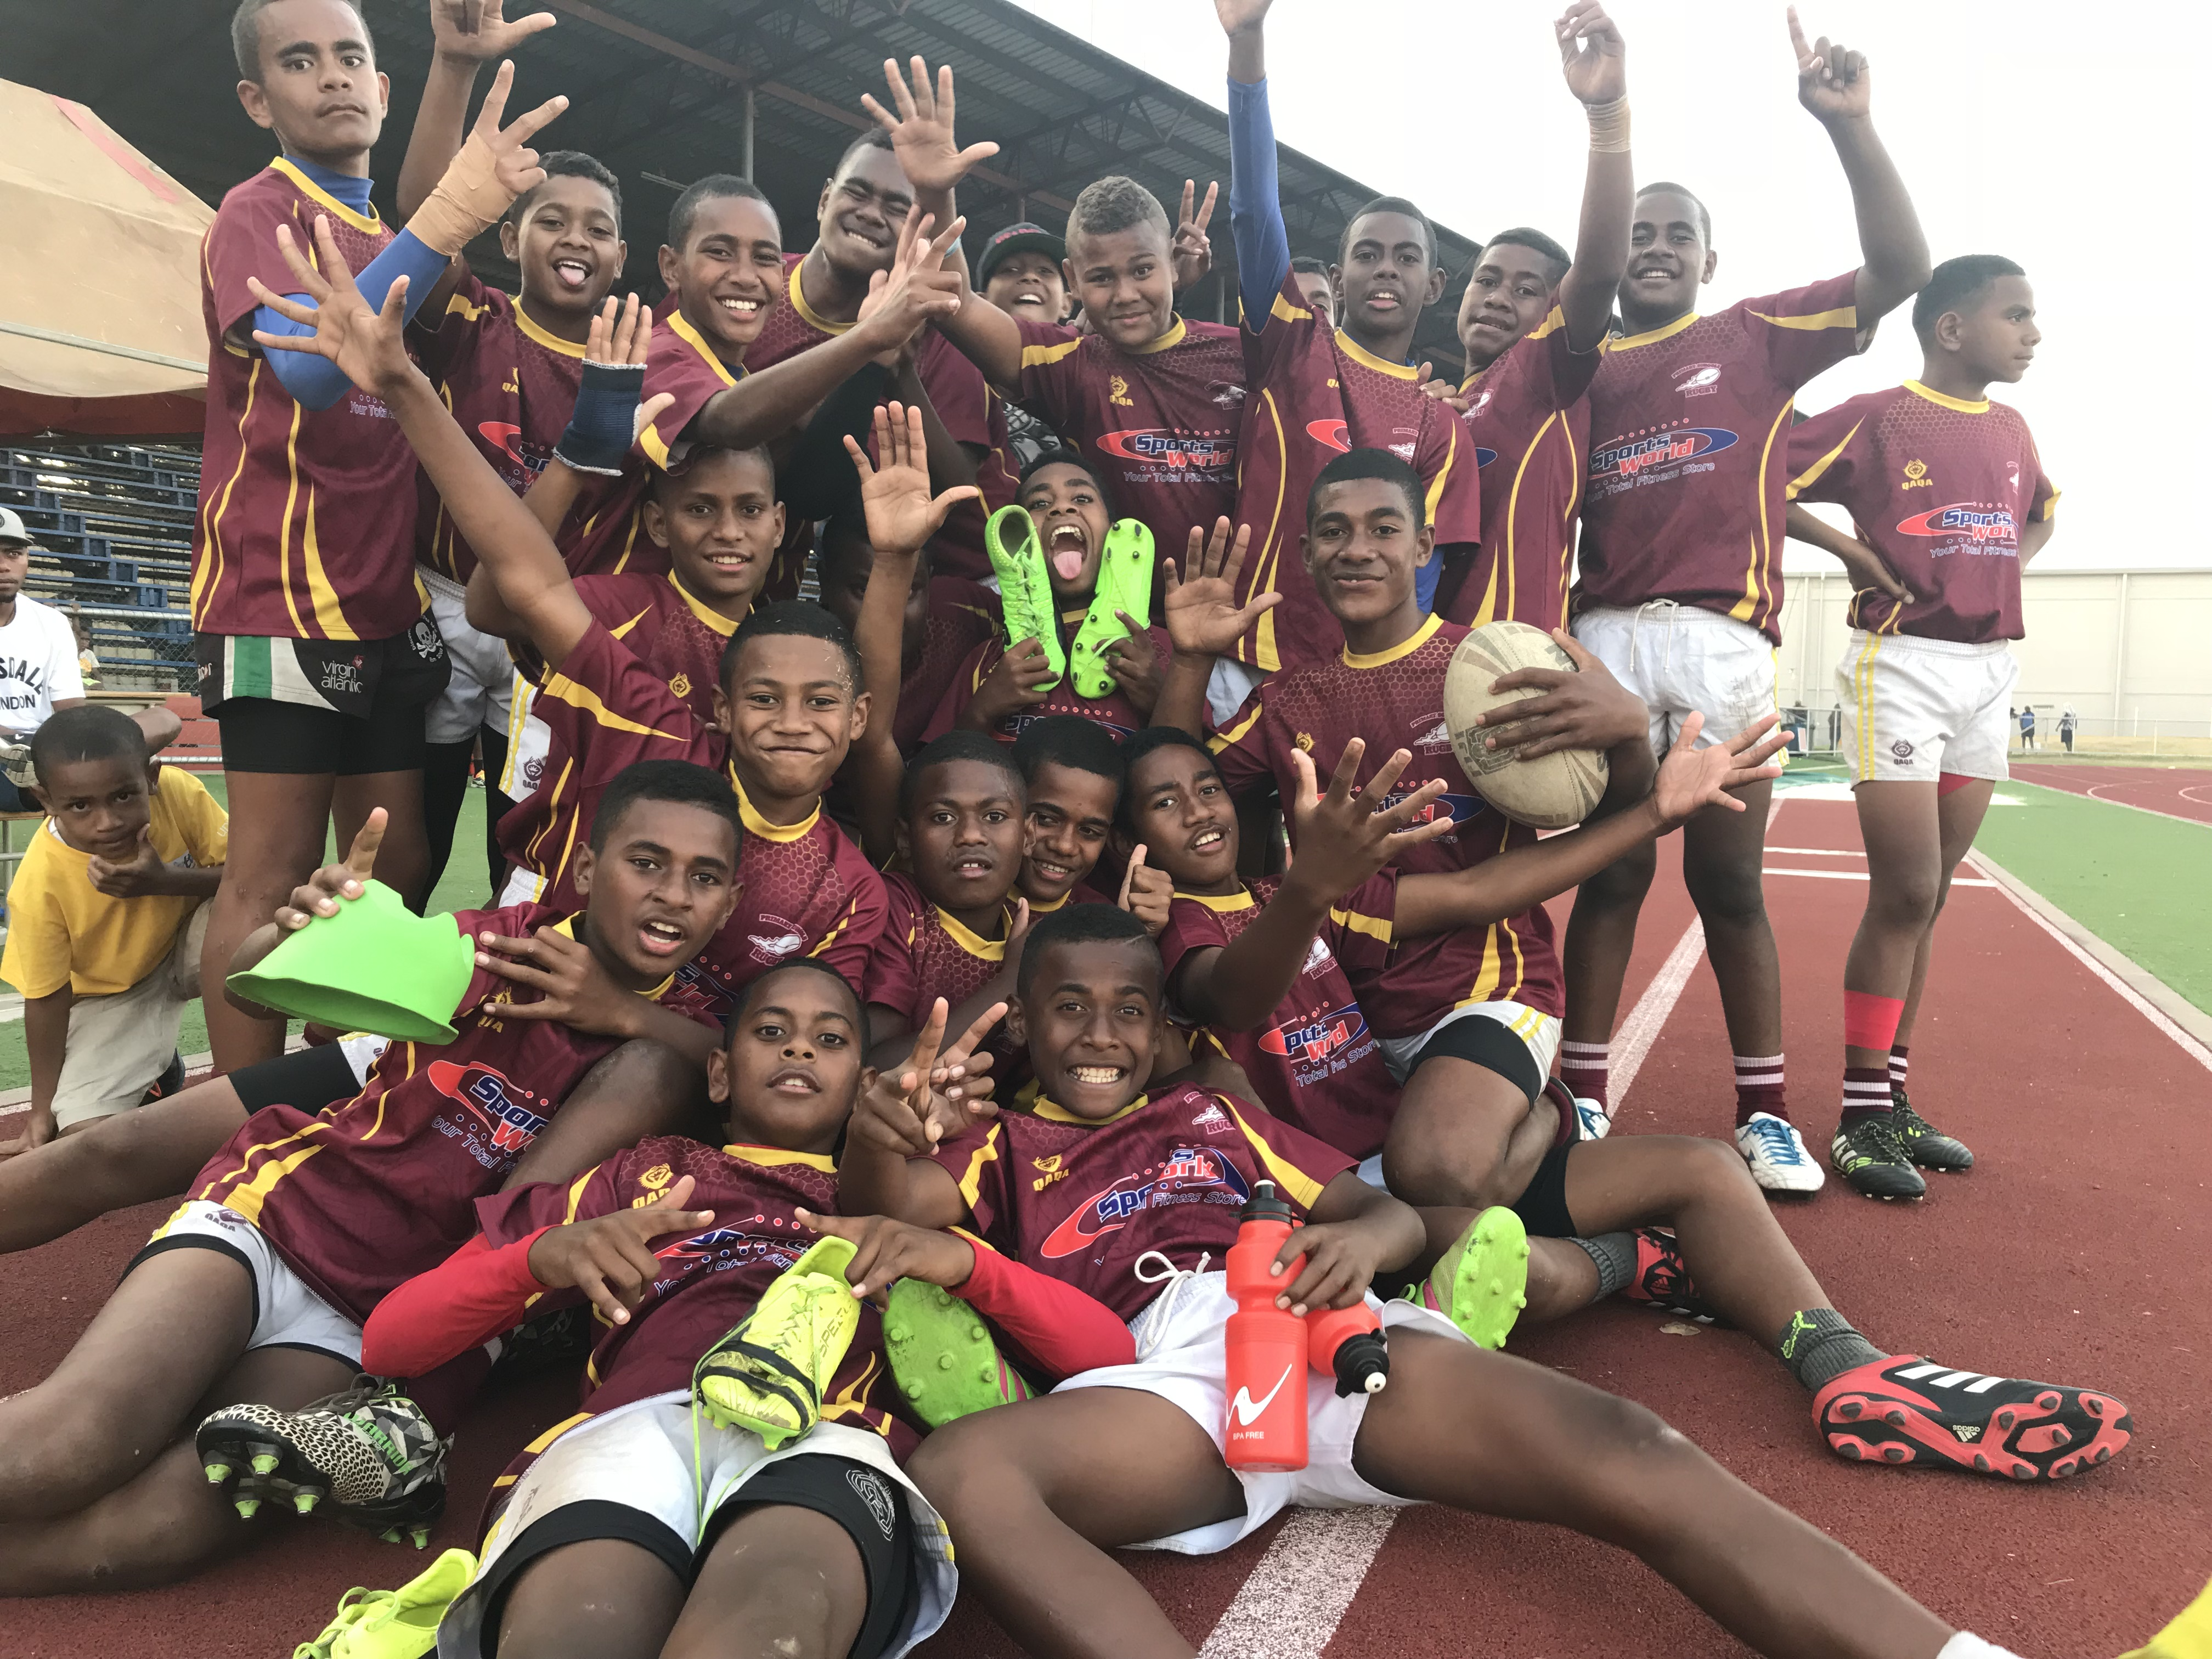 Lautoka kaji rugby team at Churchill Park on August 14, 2018. Photo: Yogesh Chandra